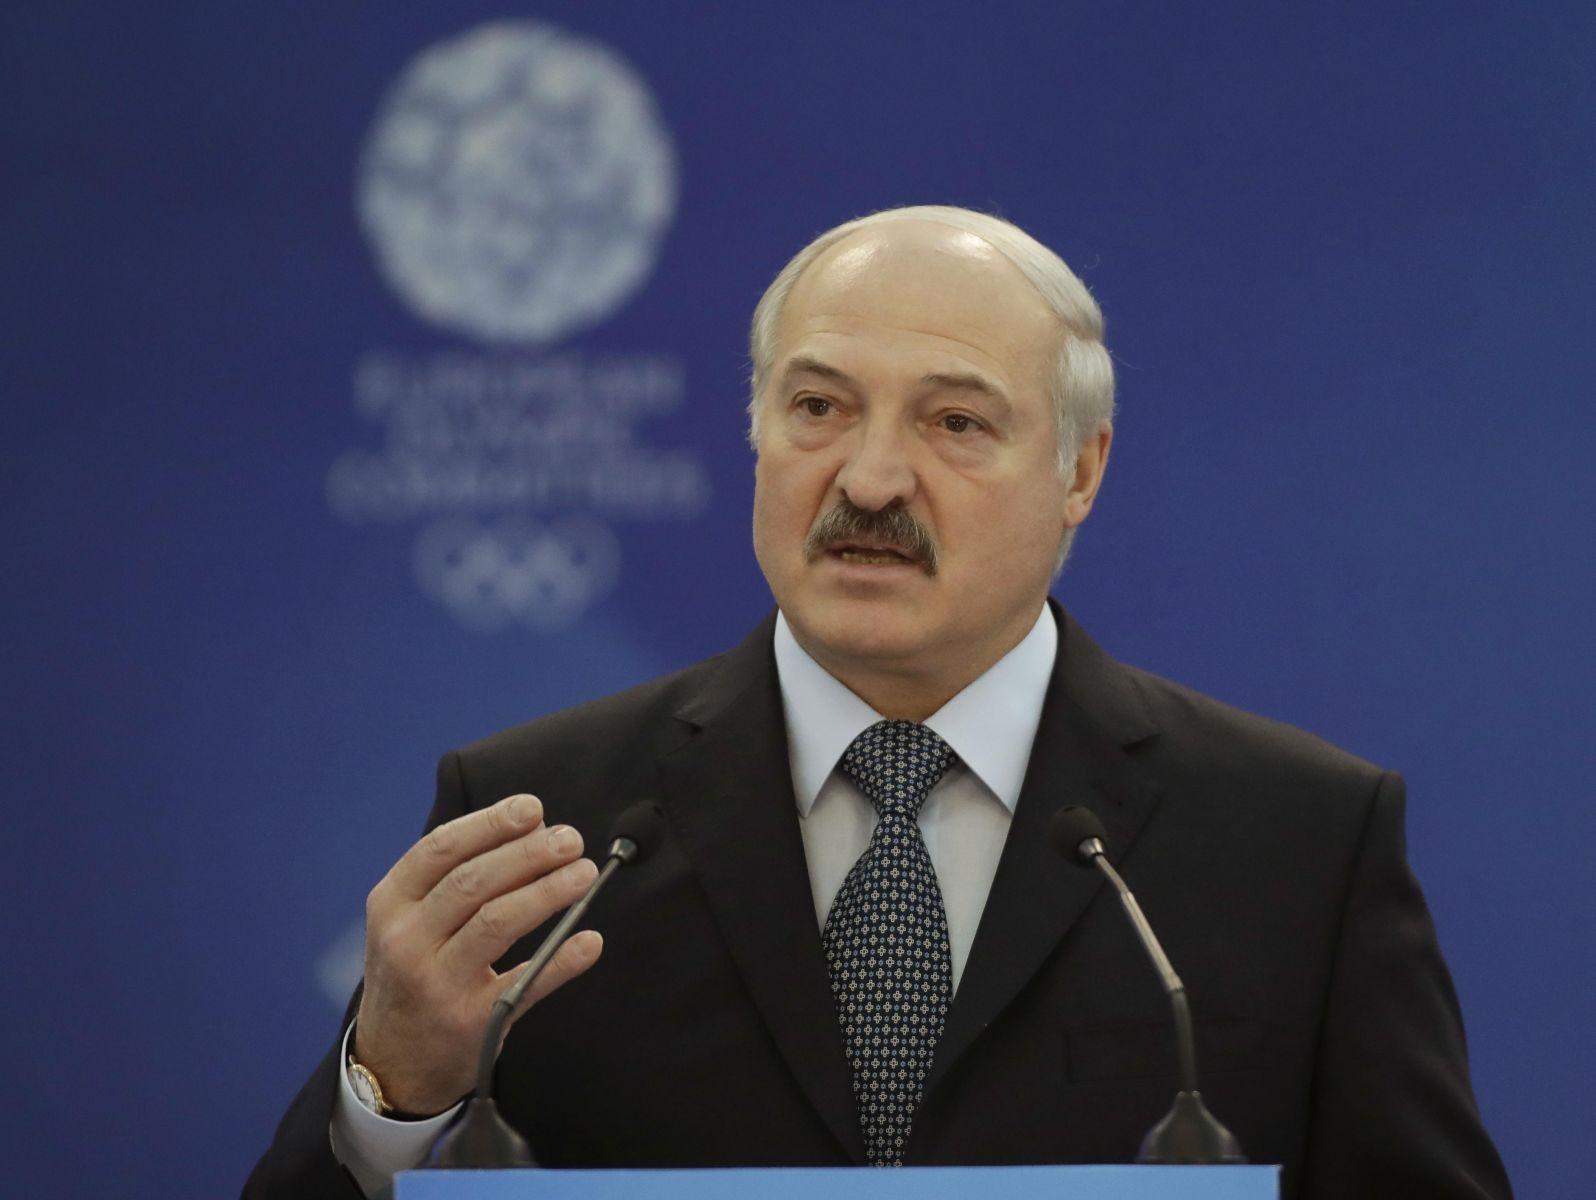 Career growth of Lukashenko - President of the Republic of Belarus 87